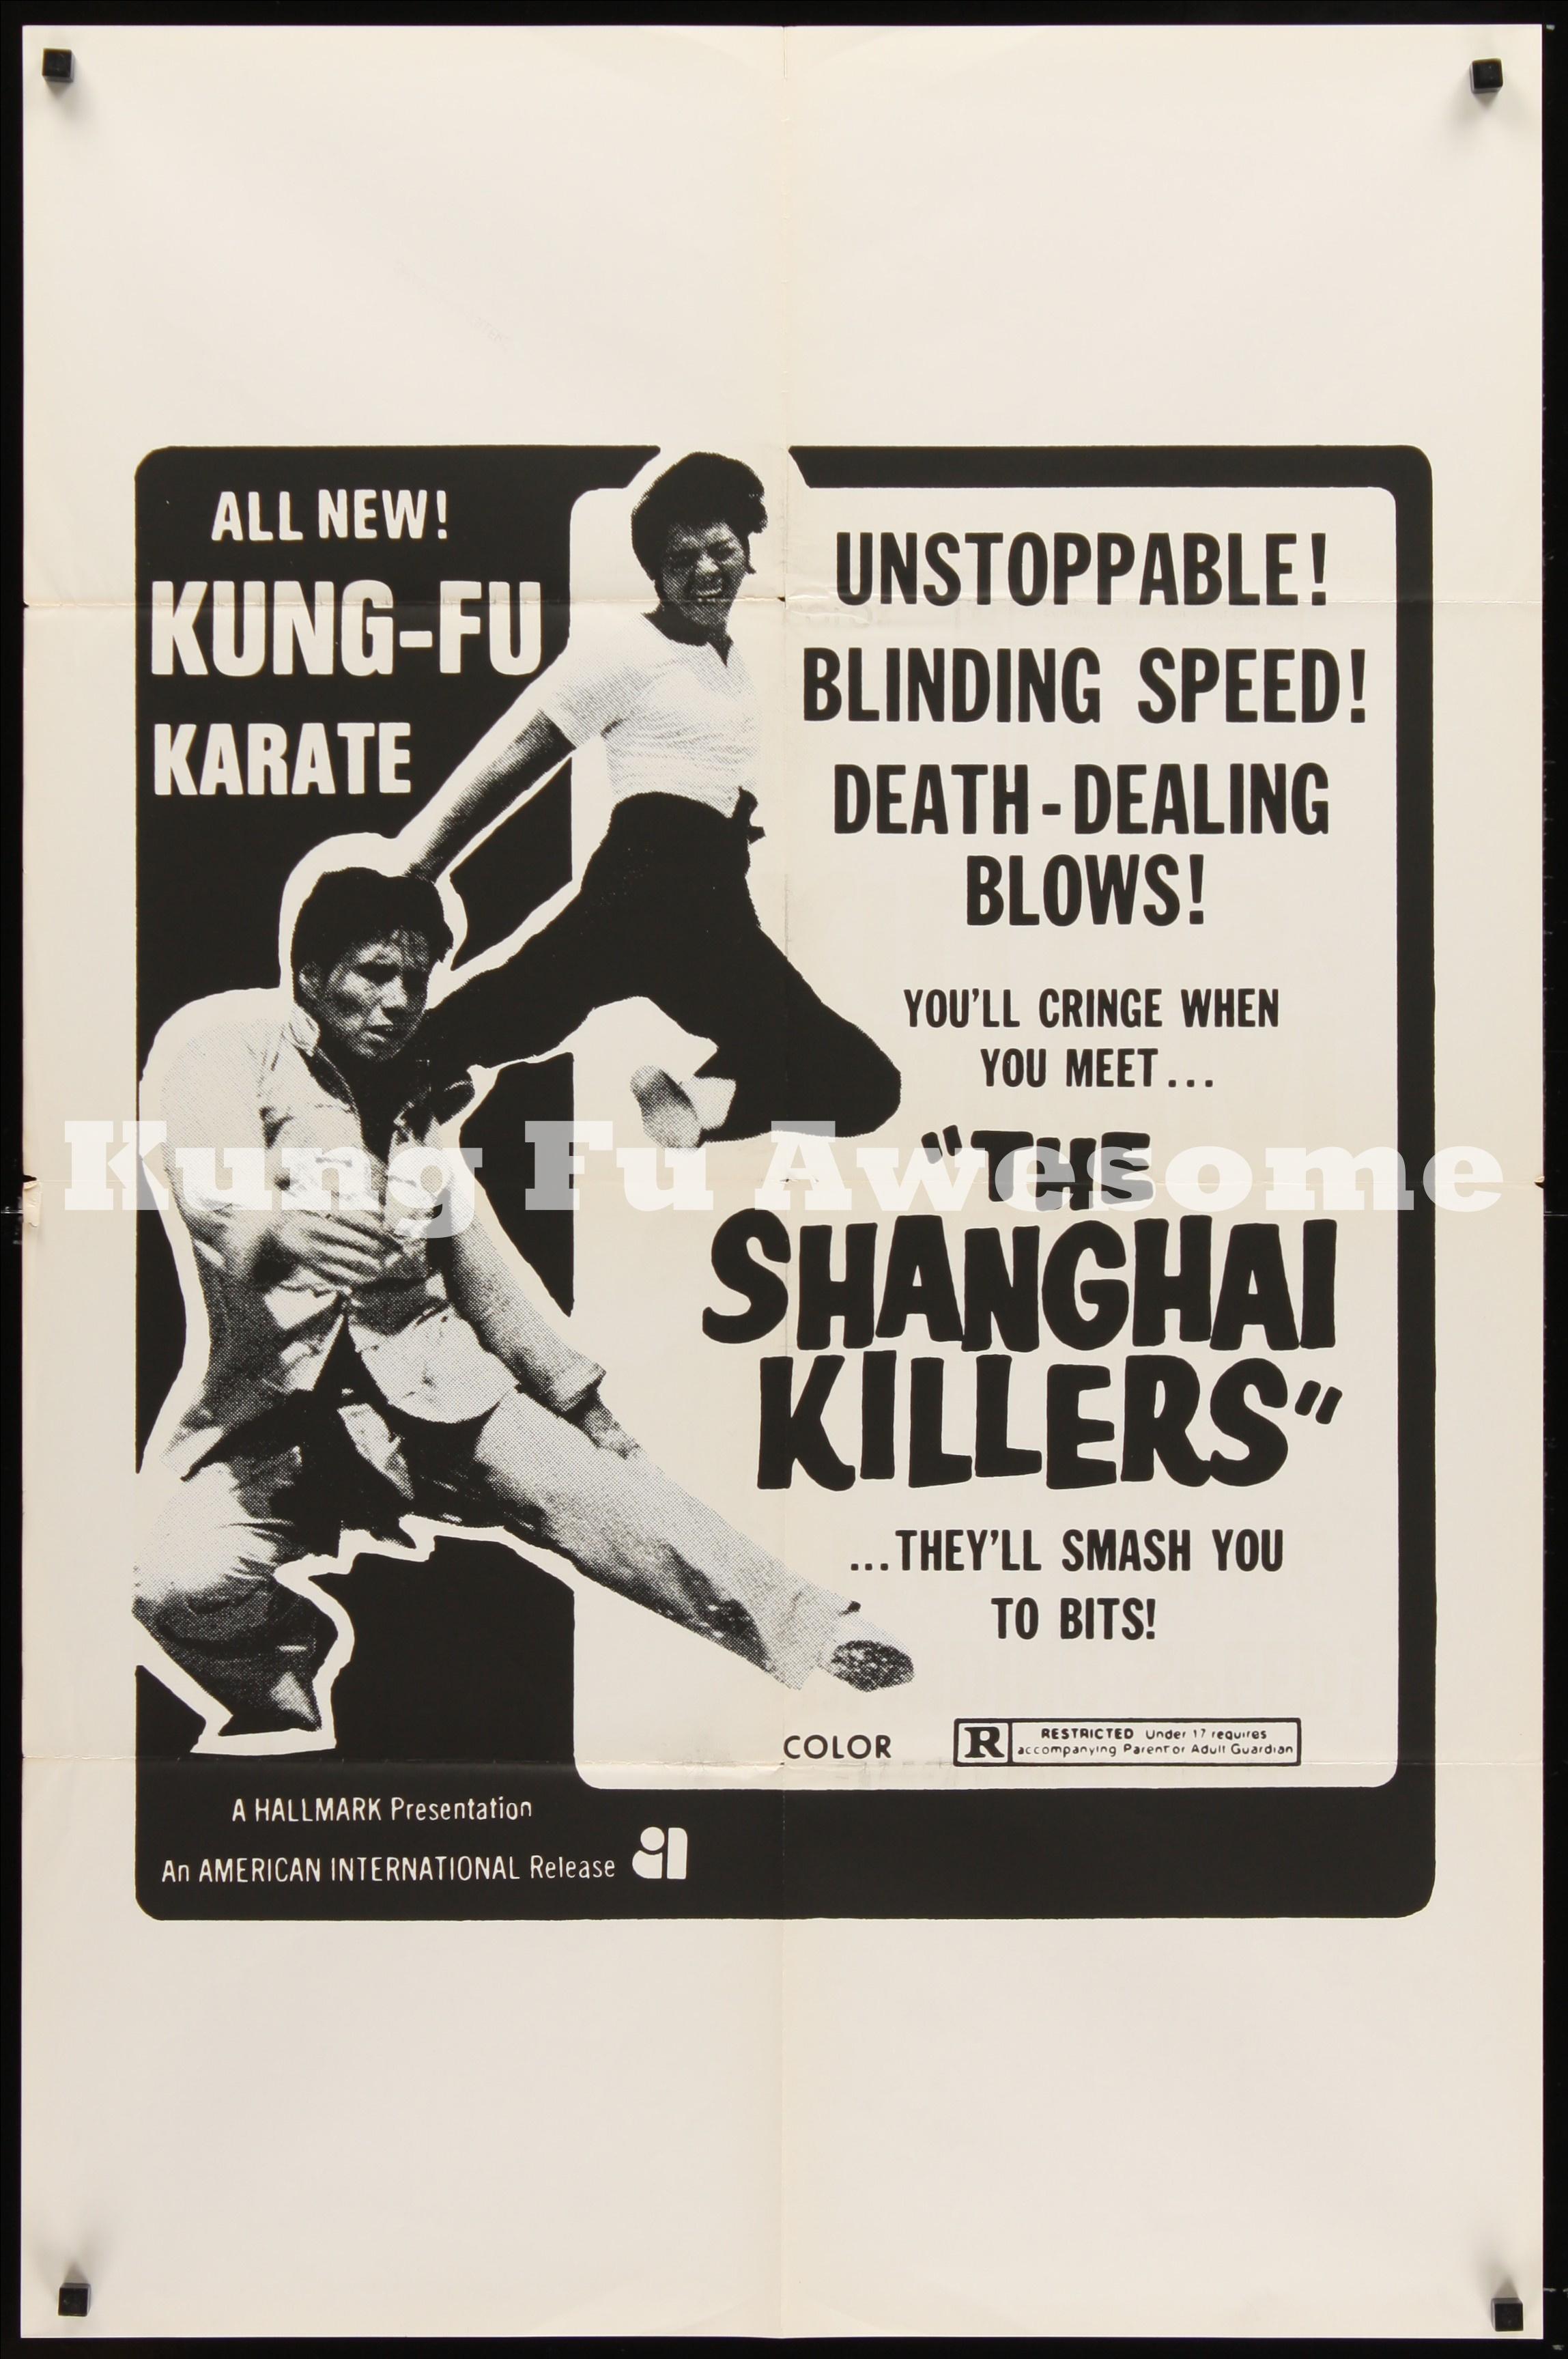 shanghai_killers_WA03011_L.jpg